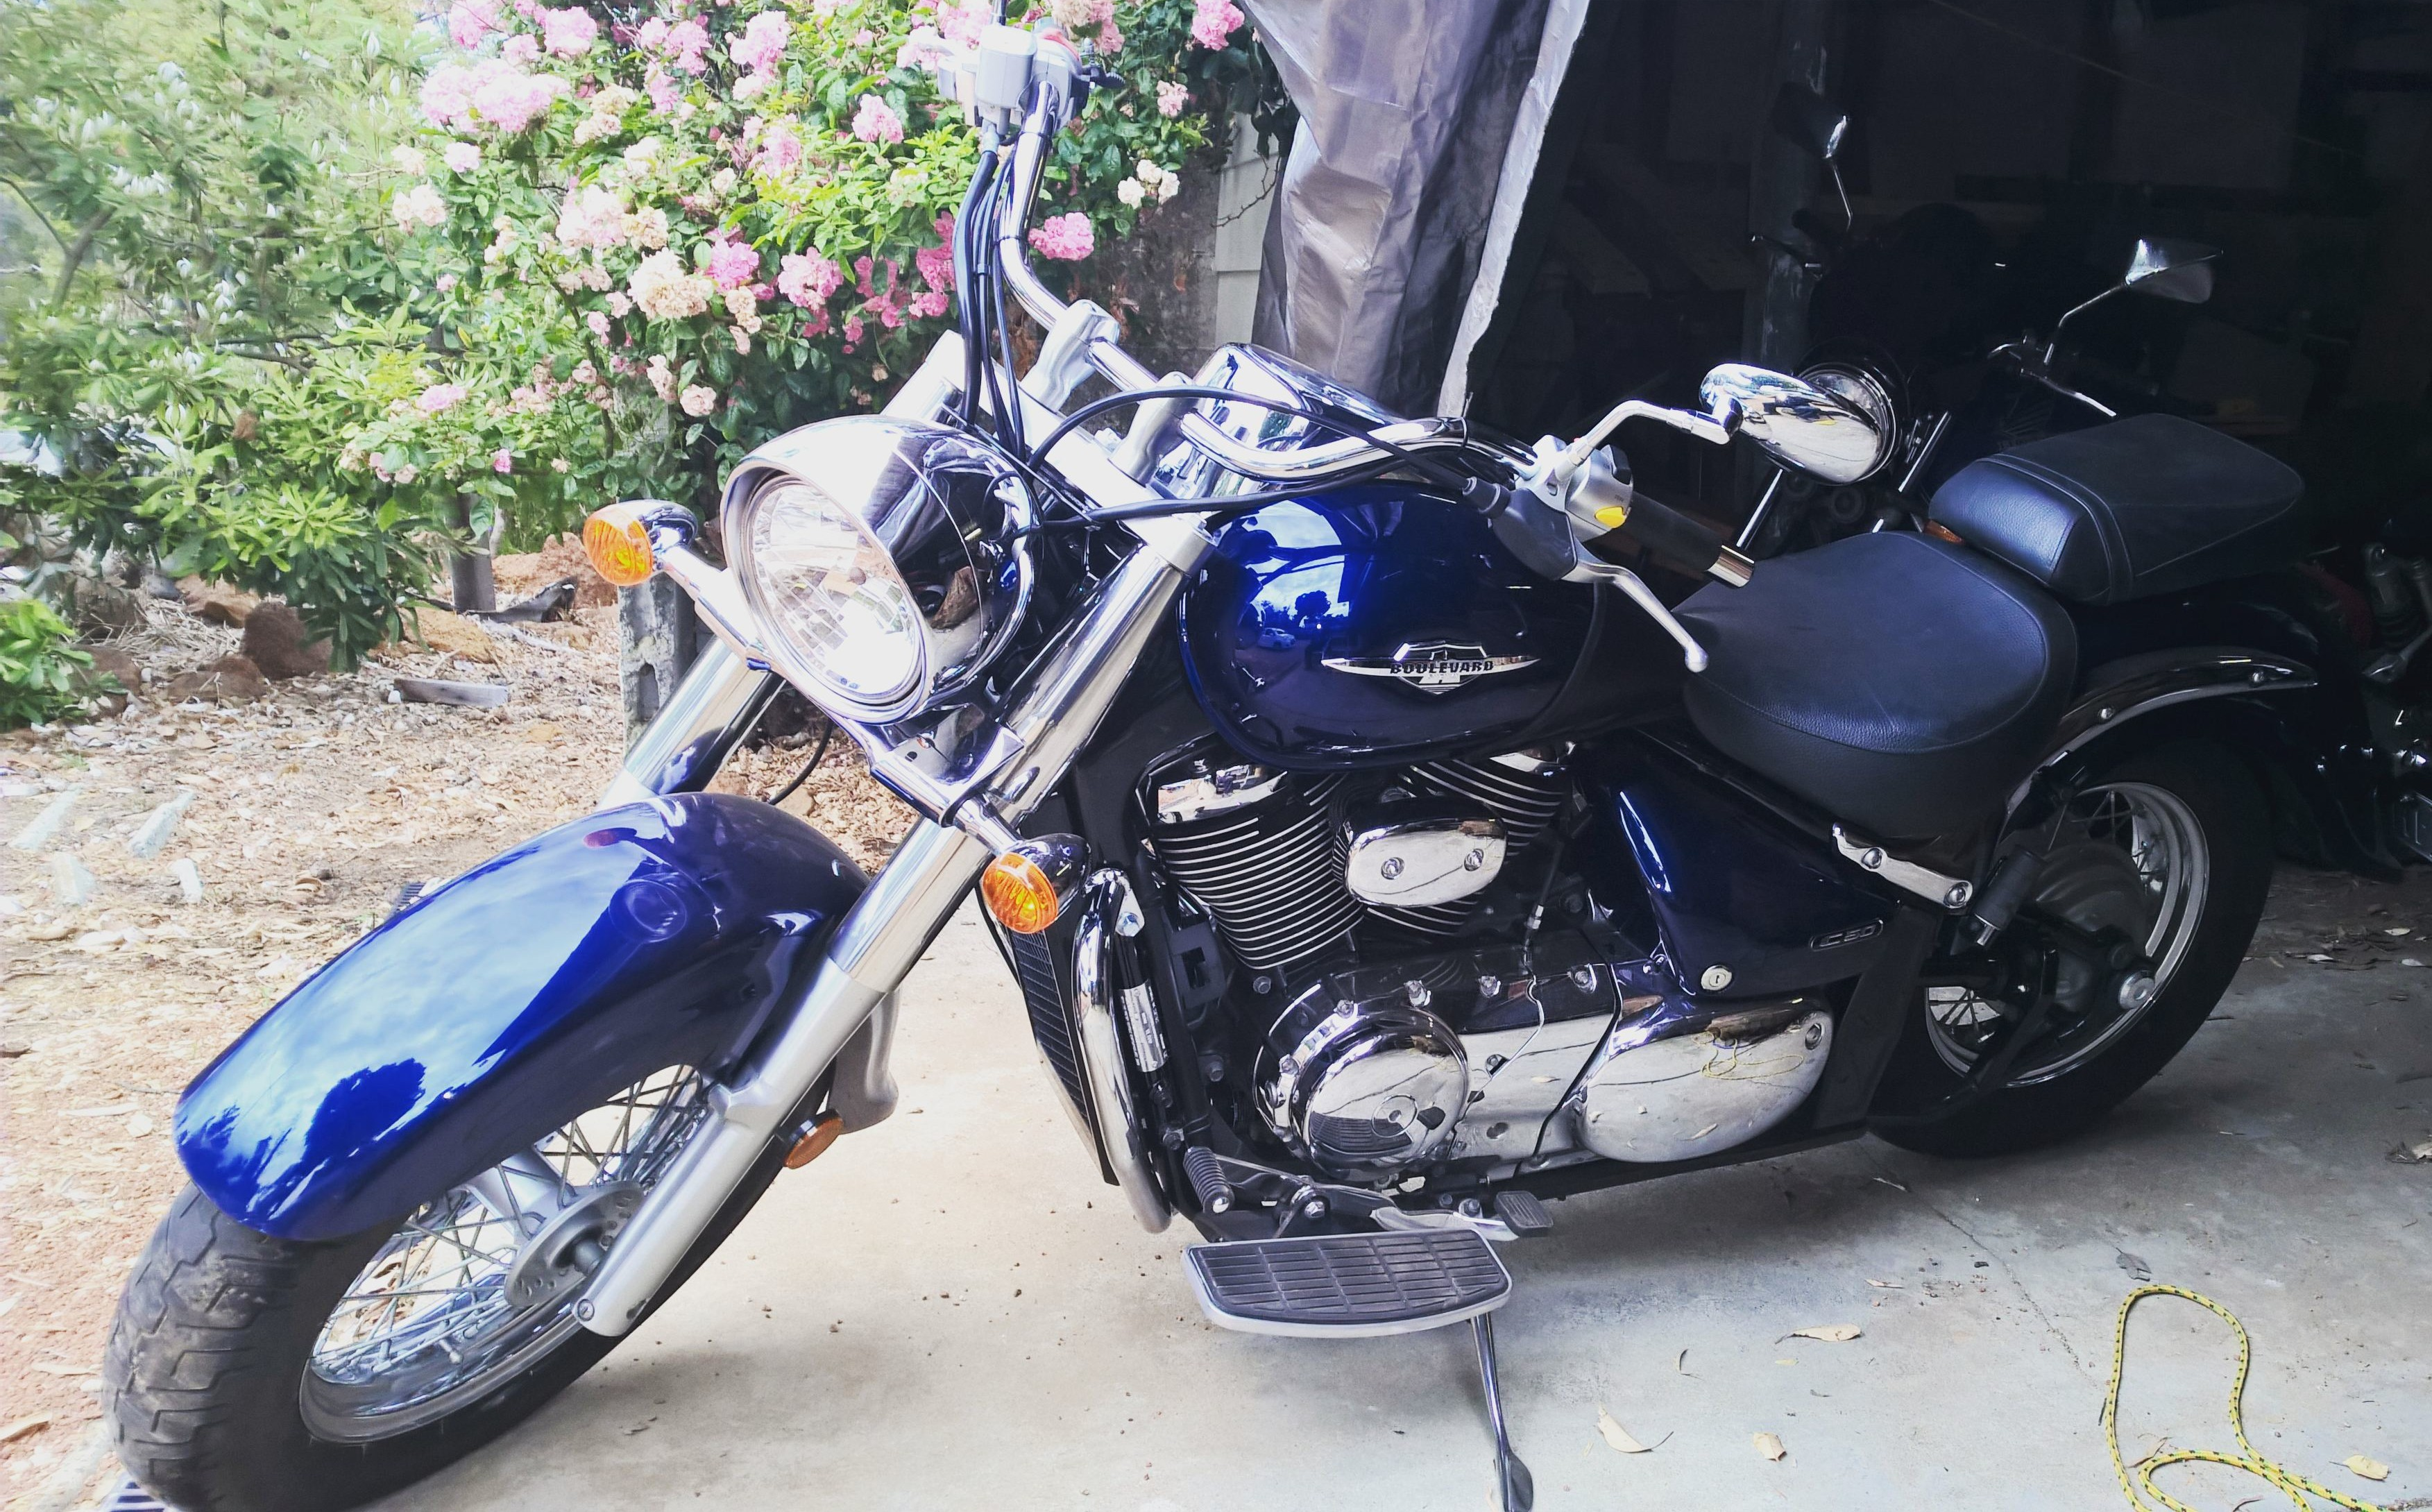 Harley Davidson Street 500 - Motorcycles in Thailand